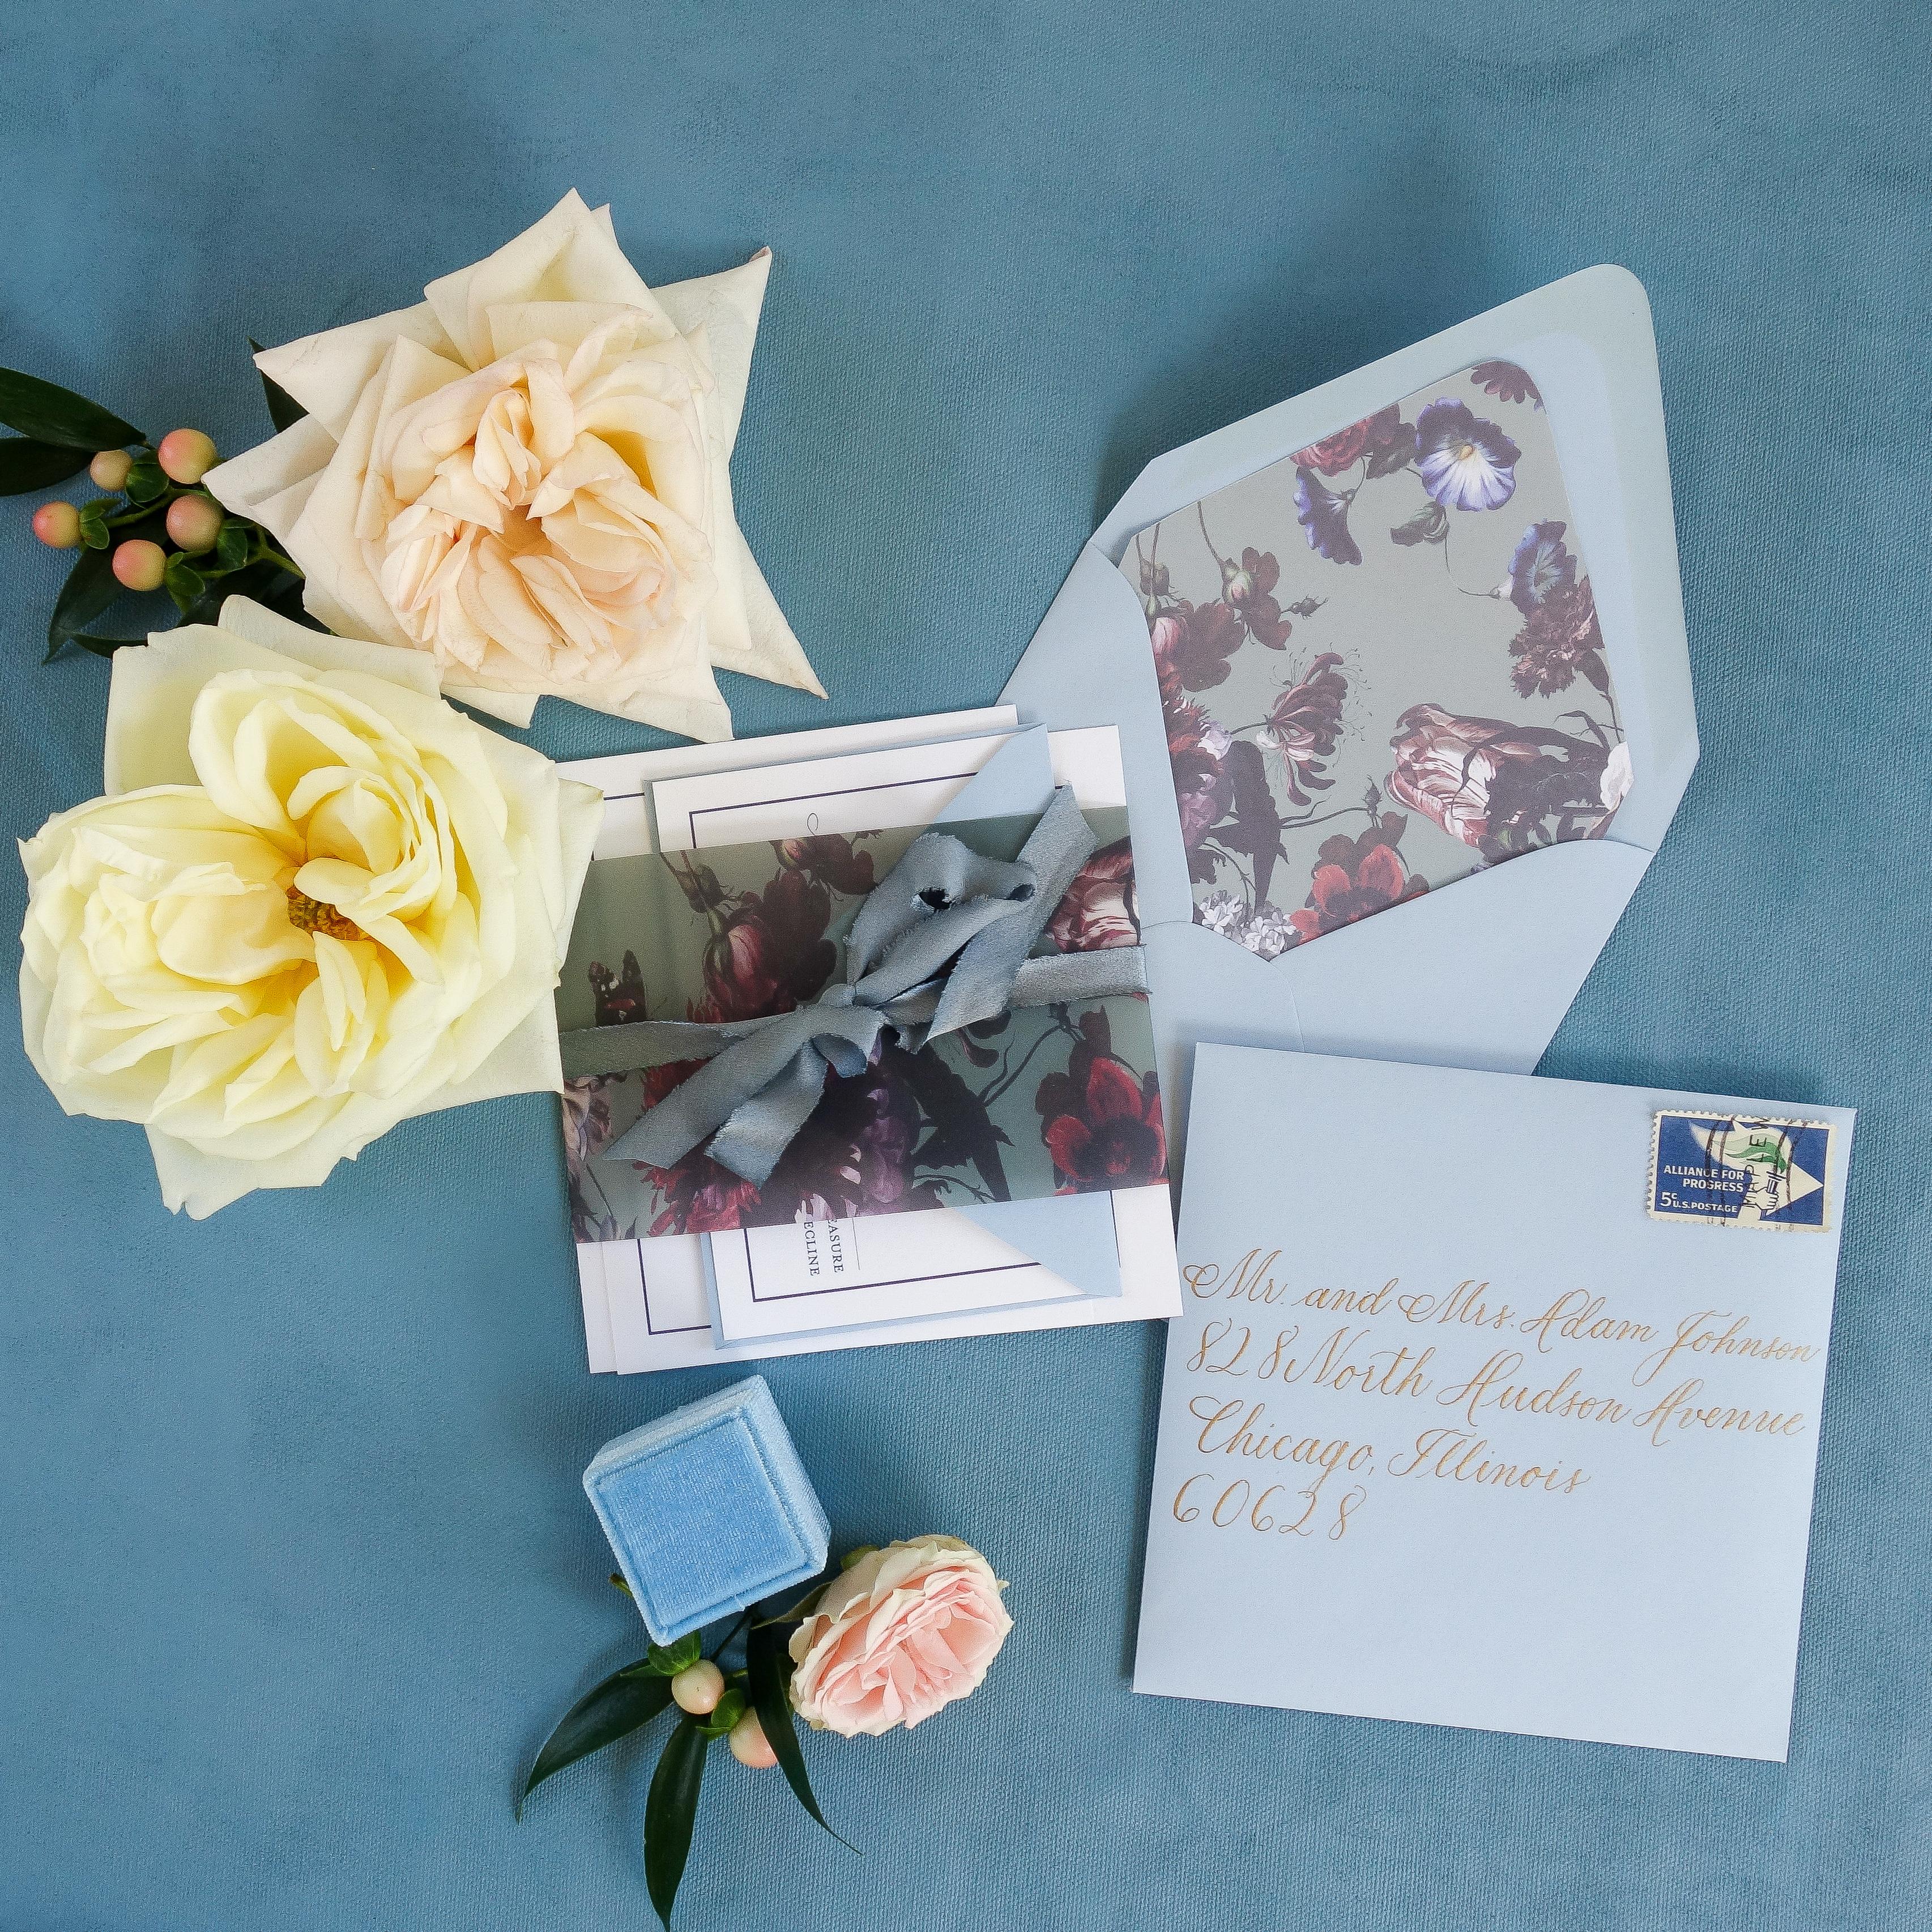 Chicago Calligrapher Chicago Wedding Invitations (3)